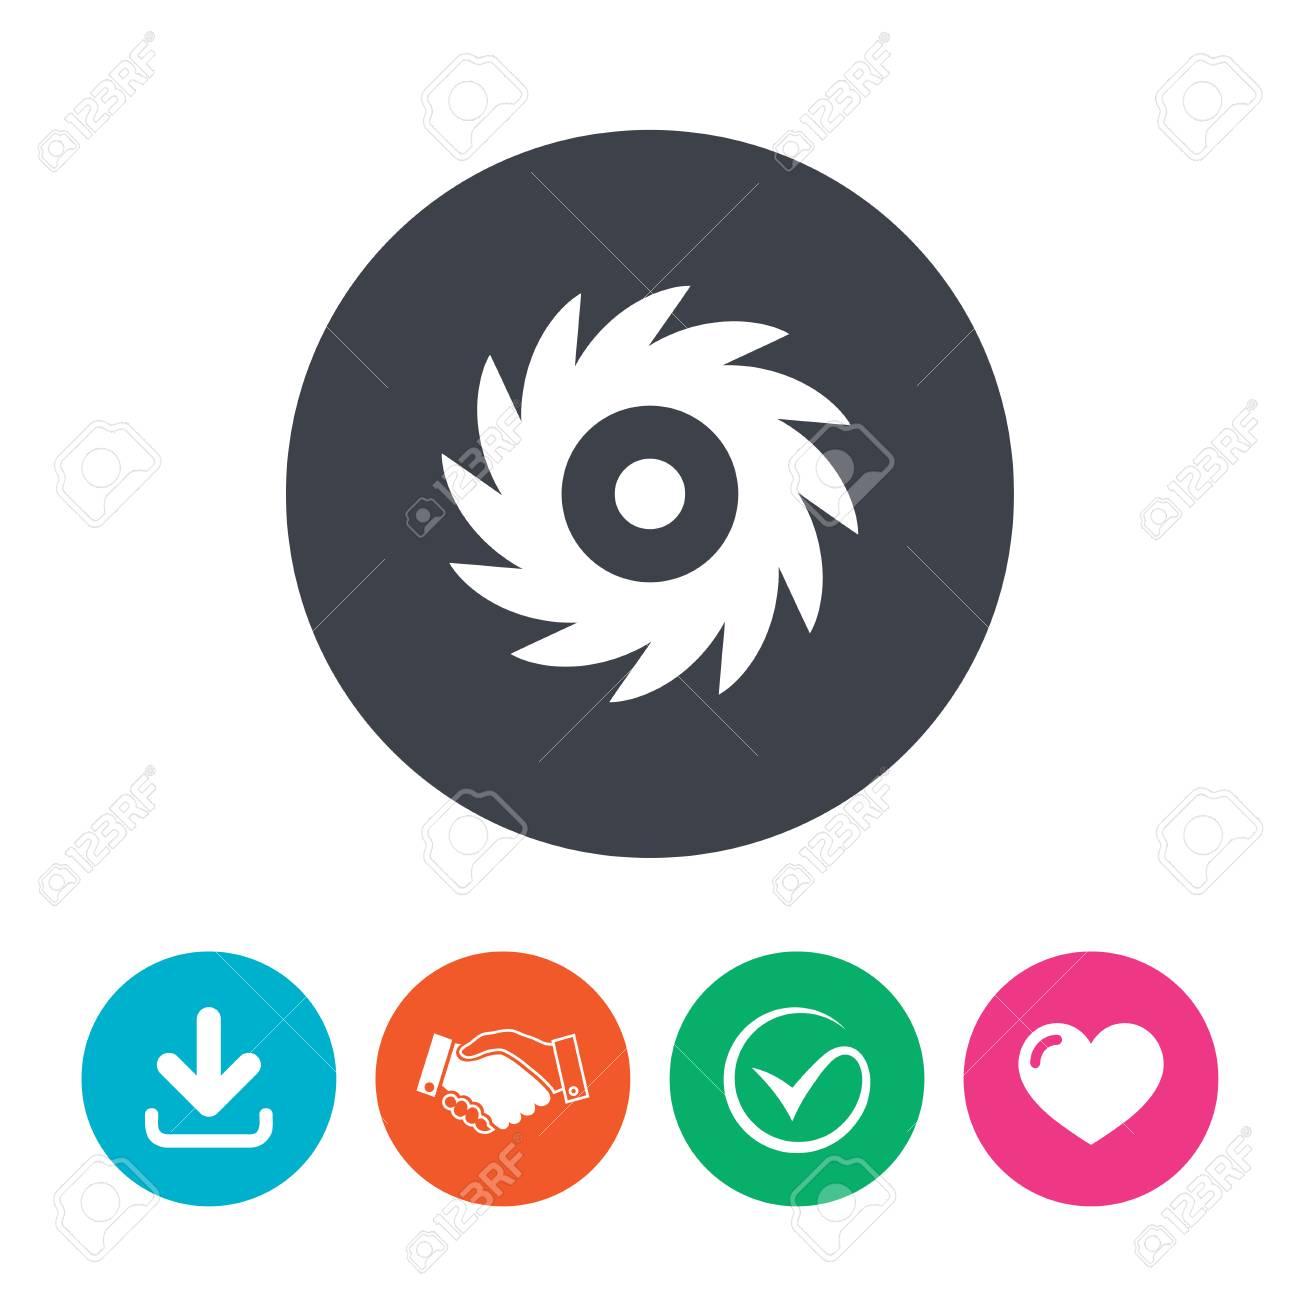 Saw circular wheel sign icon  Cutting blade symbol  Download